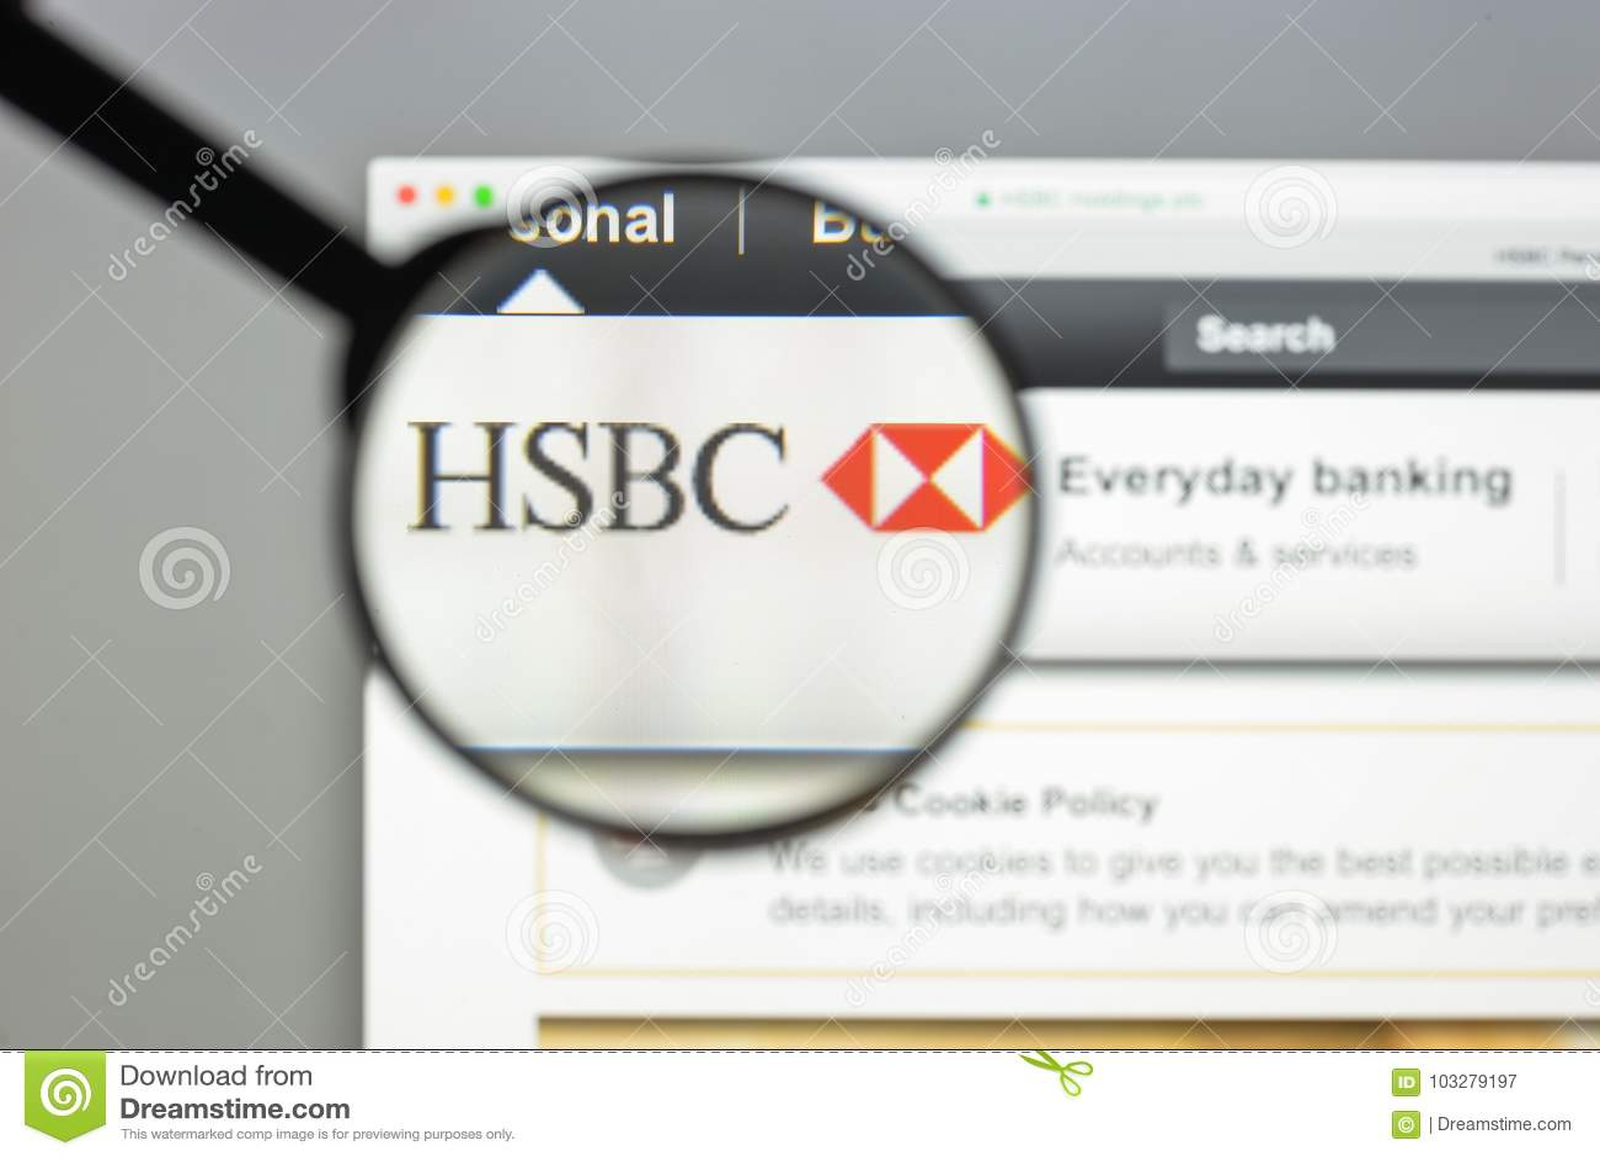 Hsbc Web